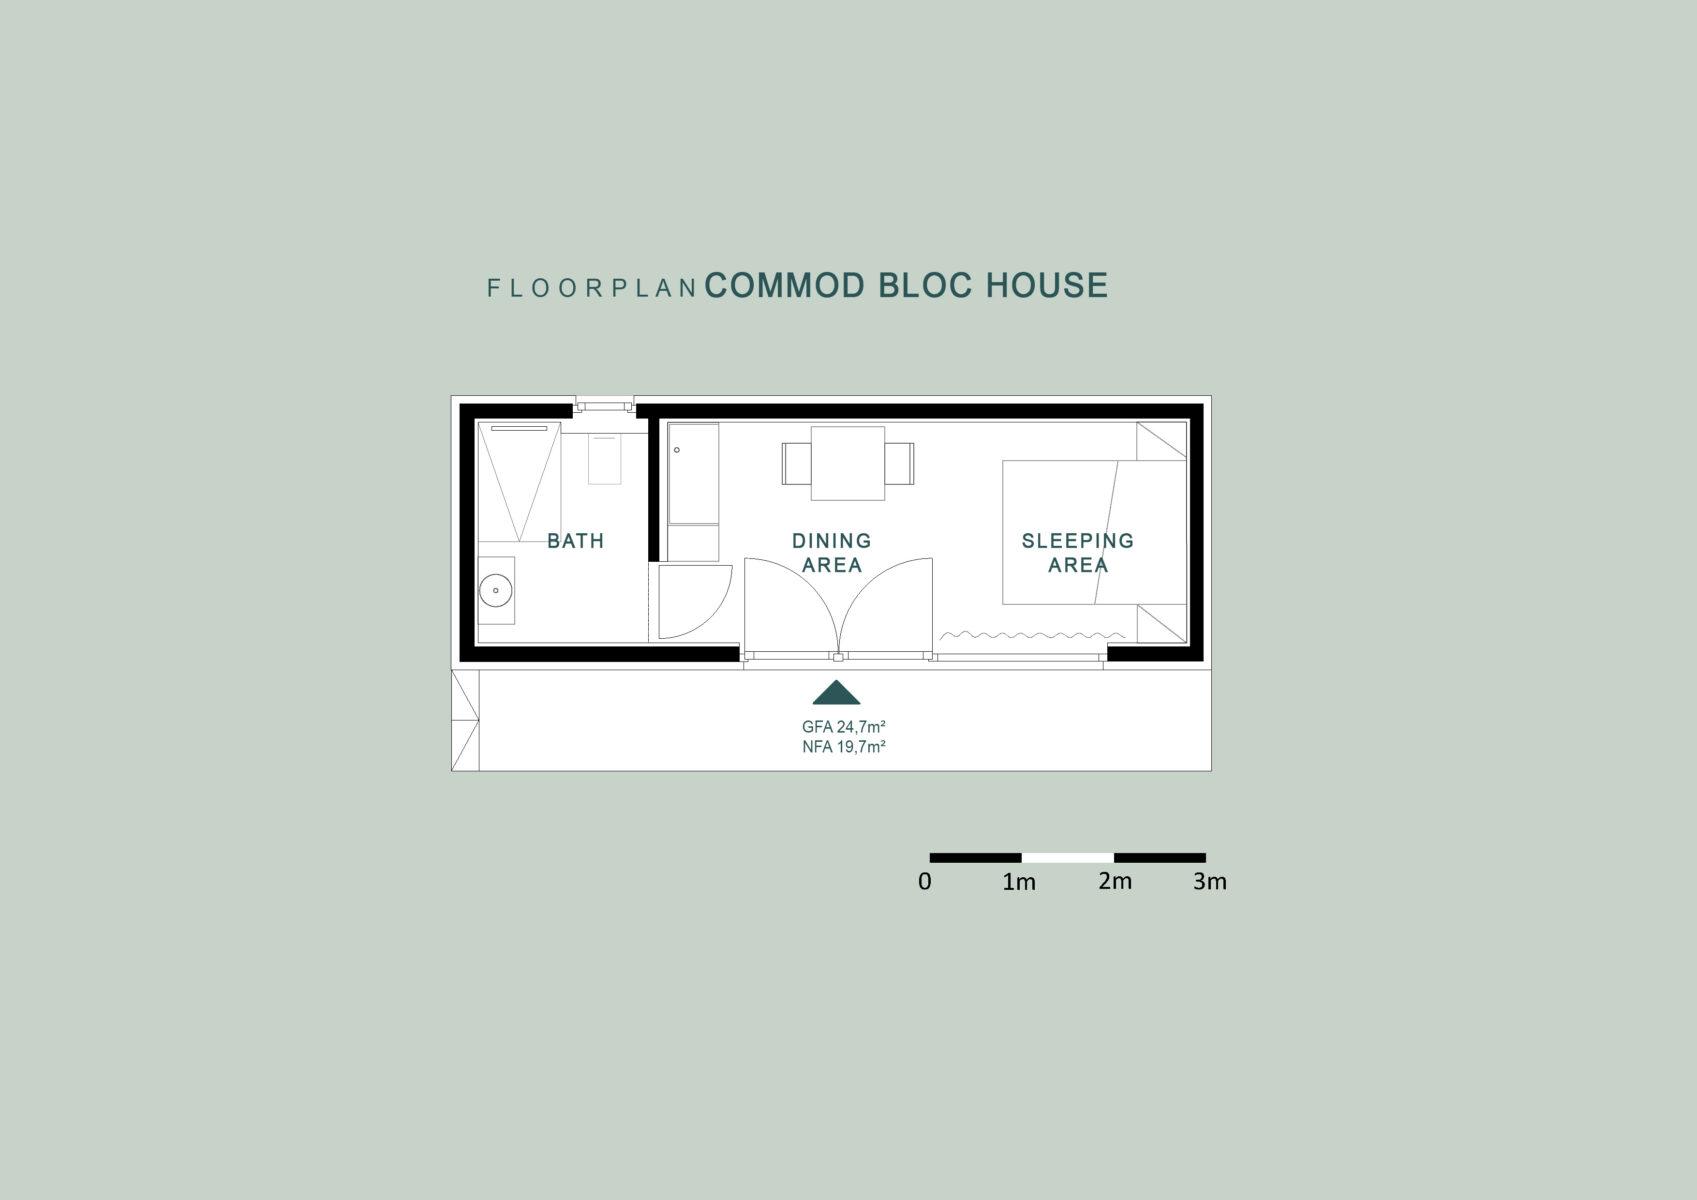 COMMOD BLOC HOUSES